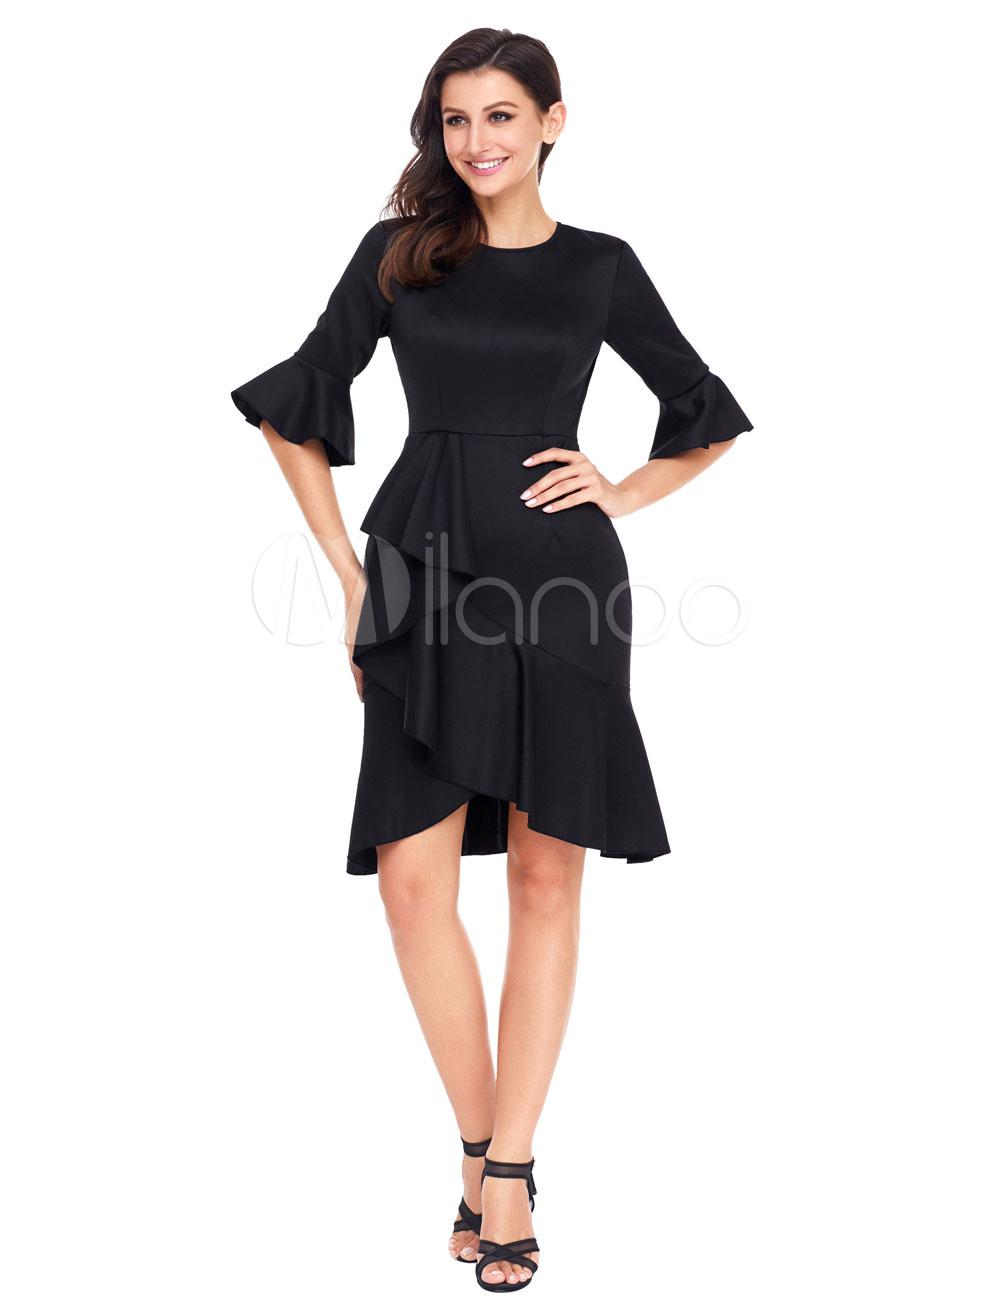 Black Bodycon Dresses Bell Sleeve Crew Neck Ruffles Asymmetrical Women Dress